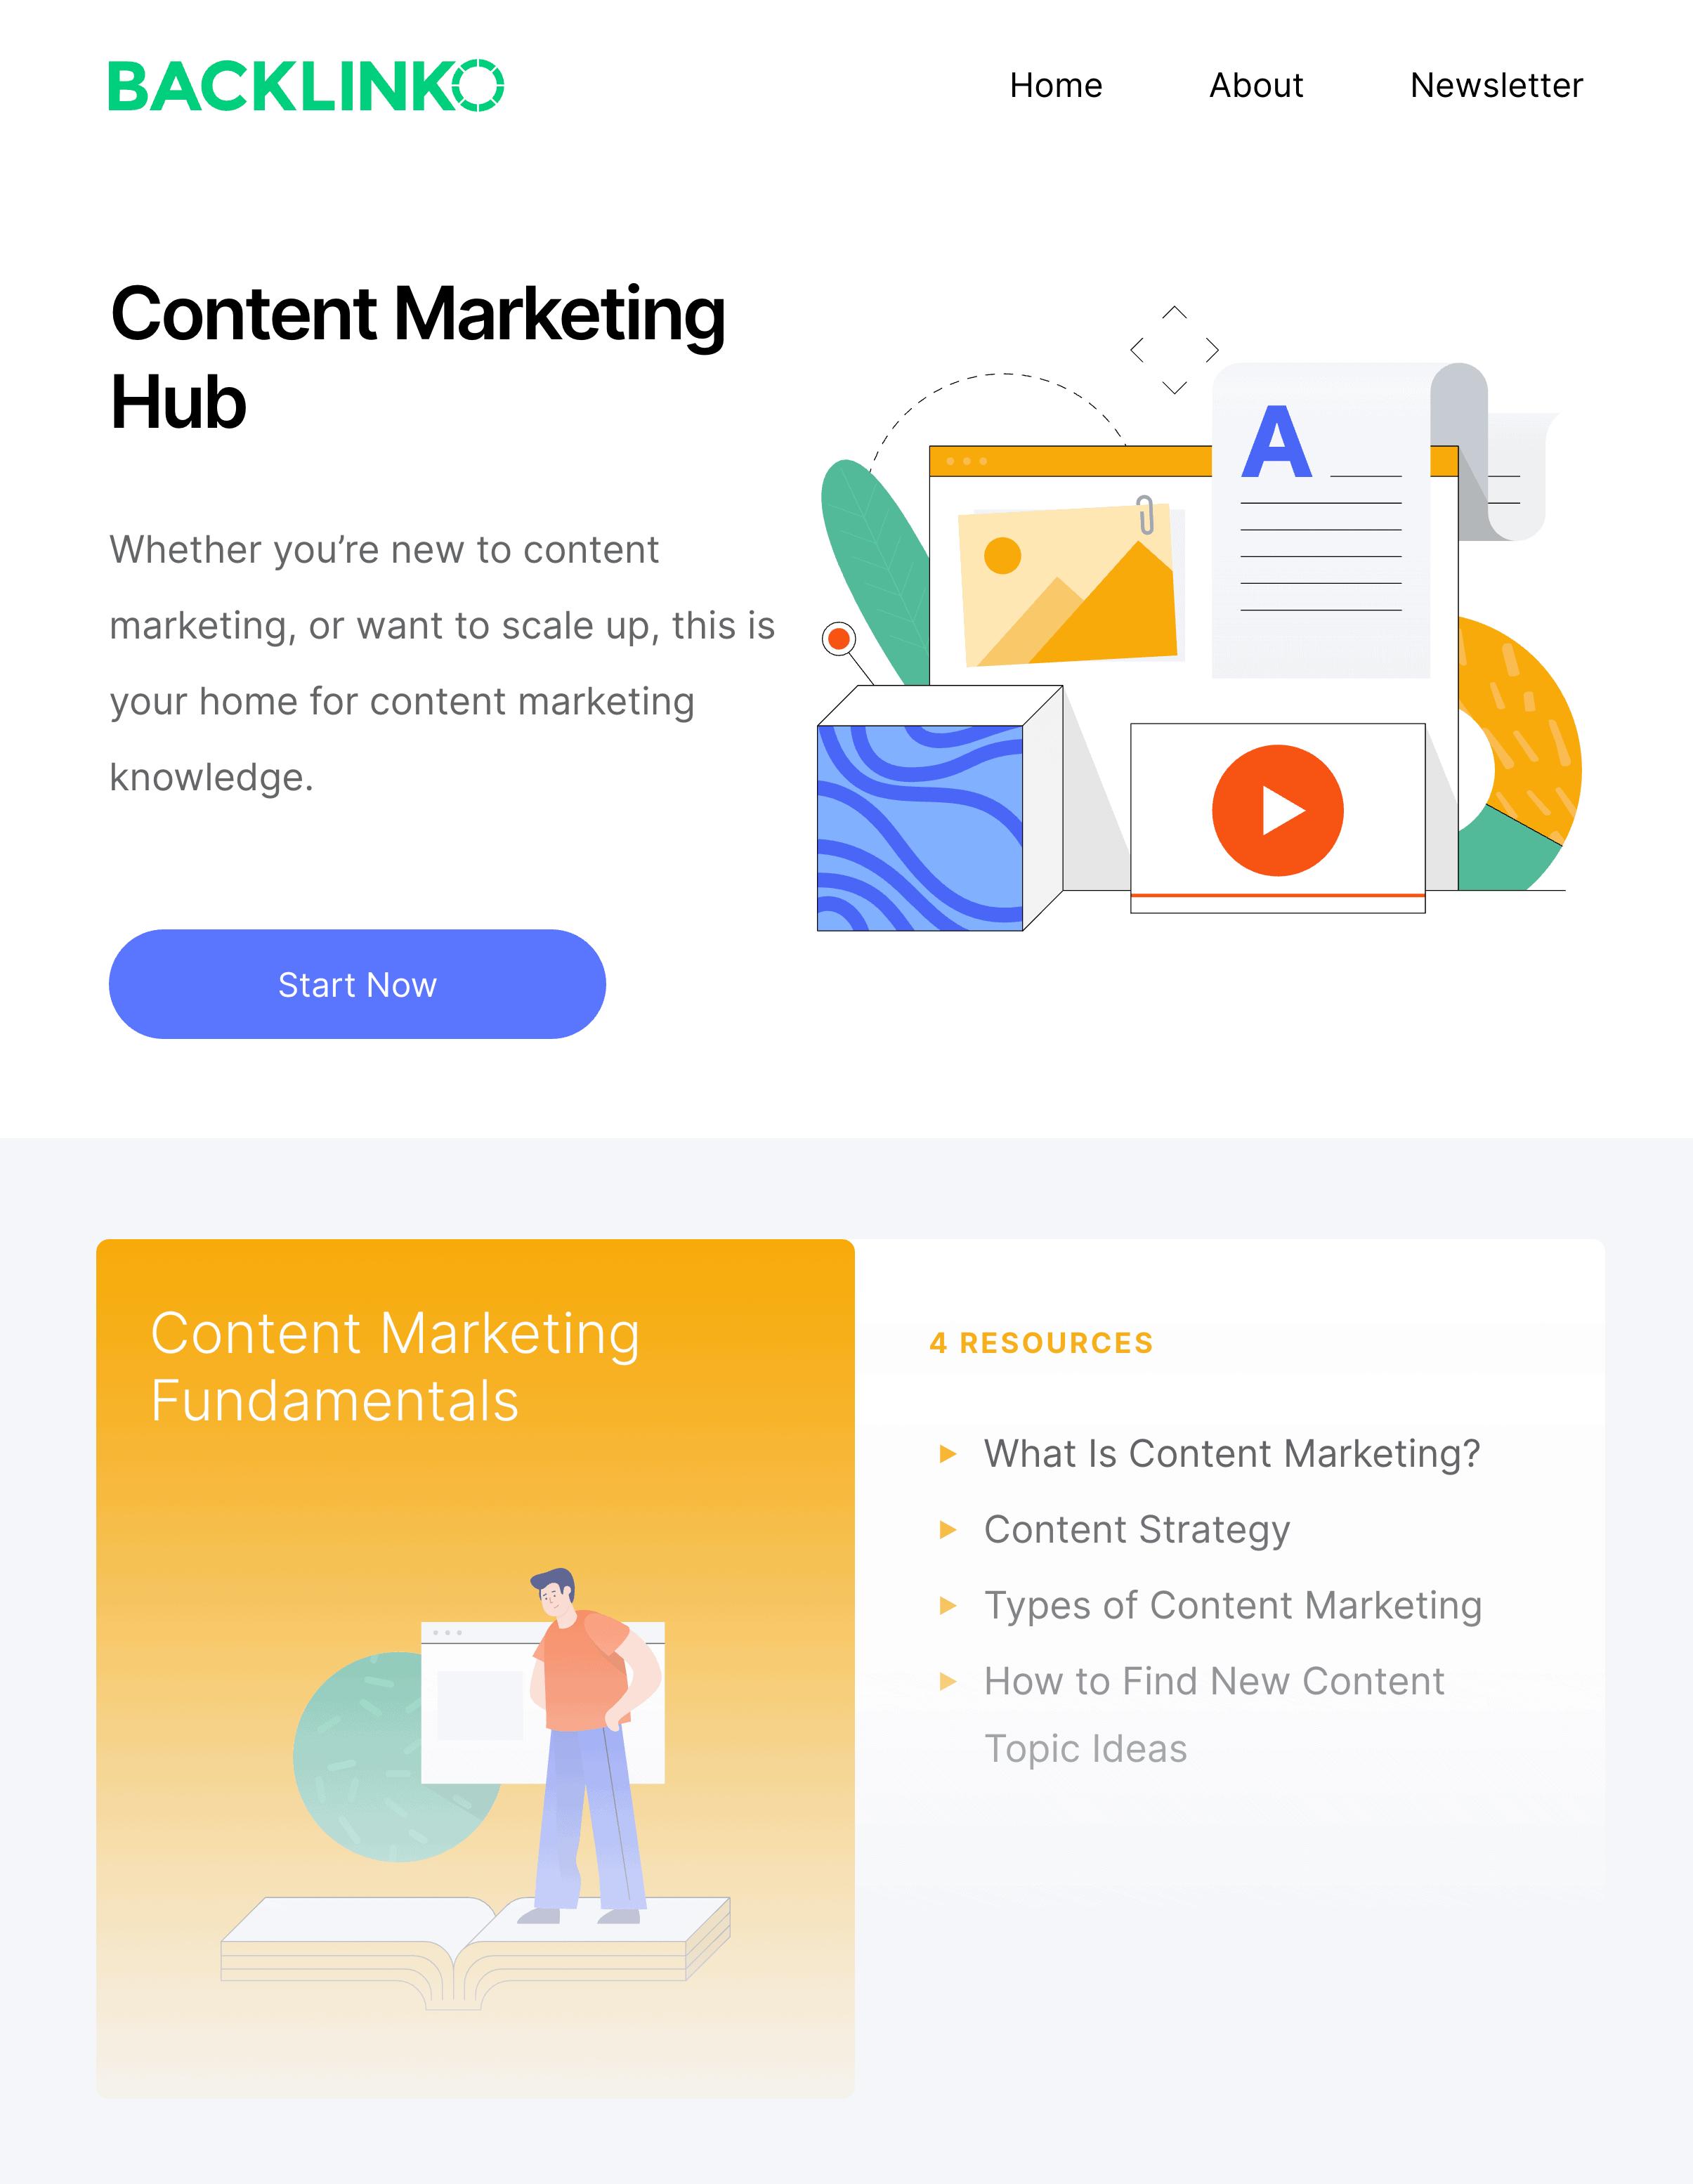 Backlinko content marketing hub